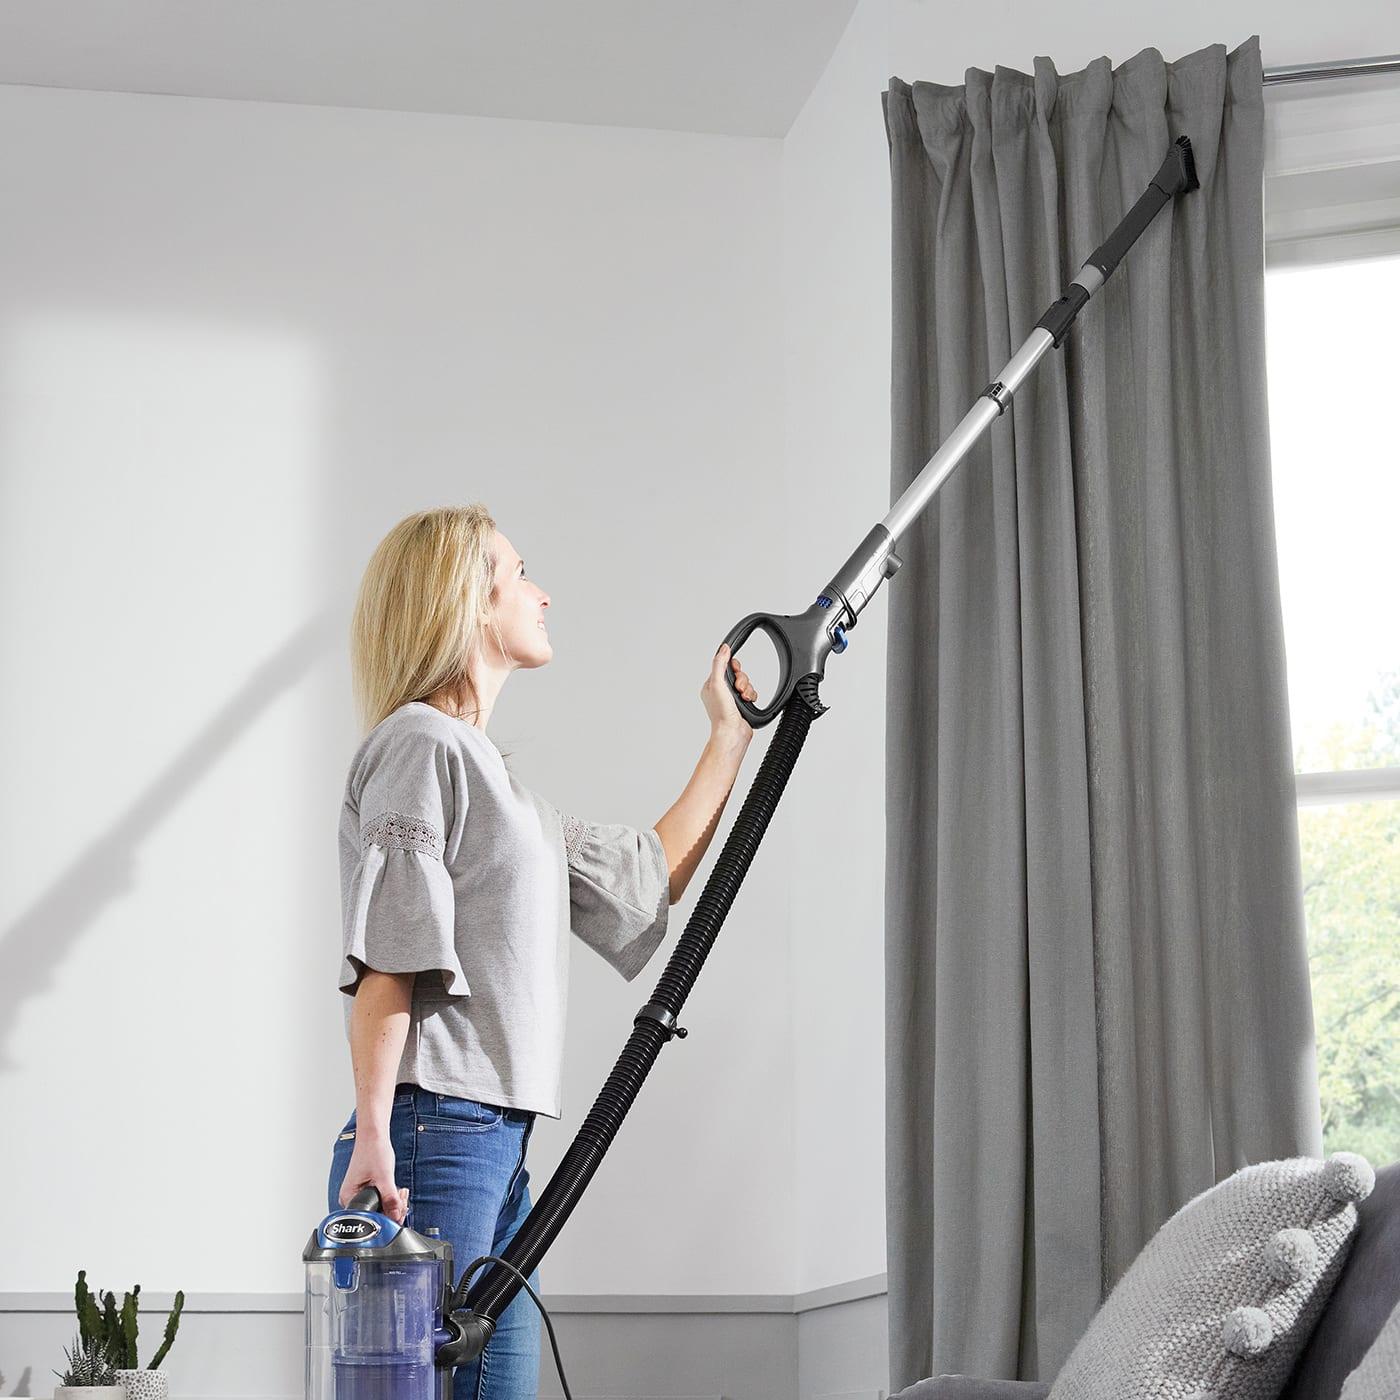 Versatile Cleaning